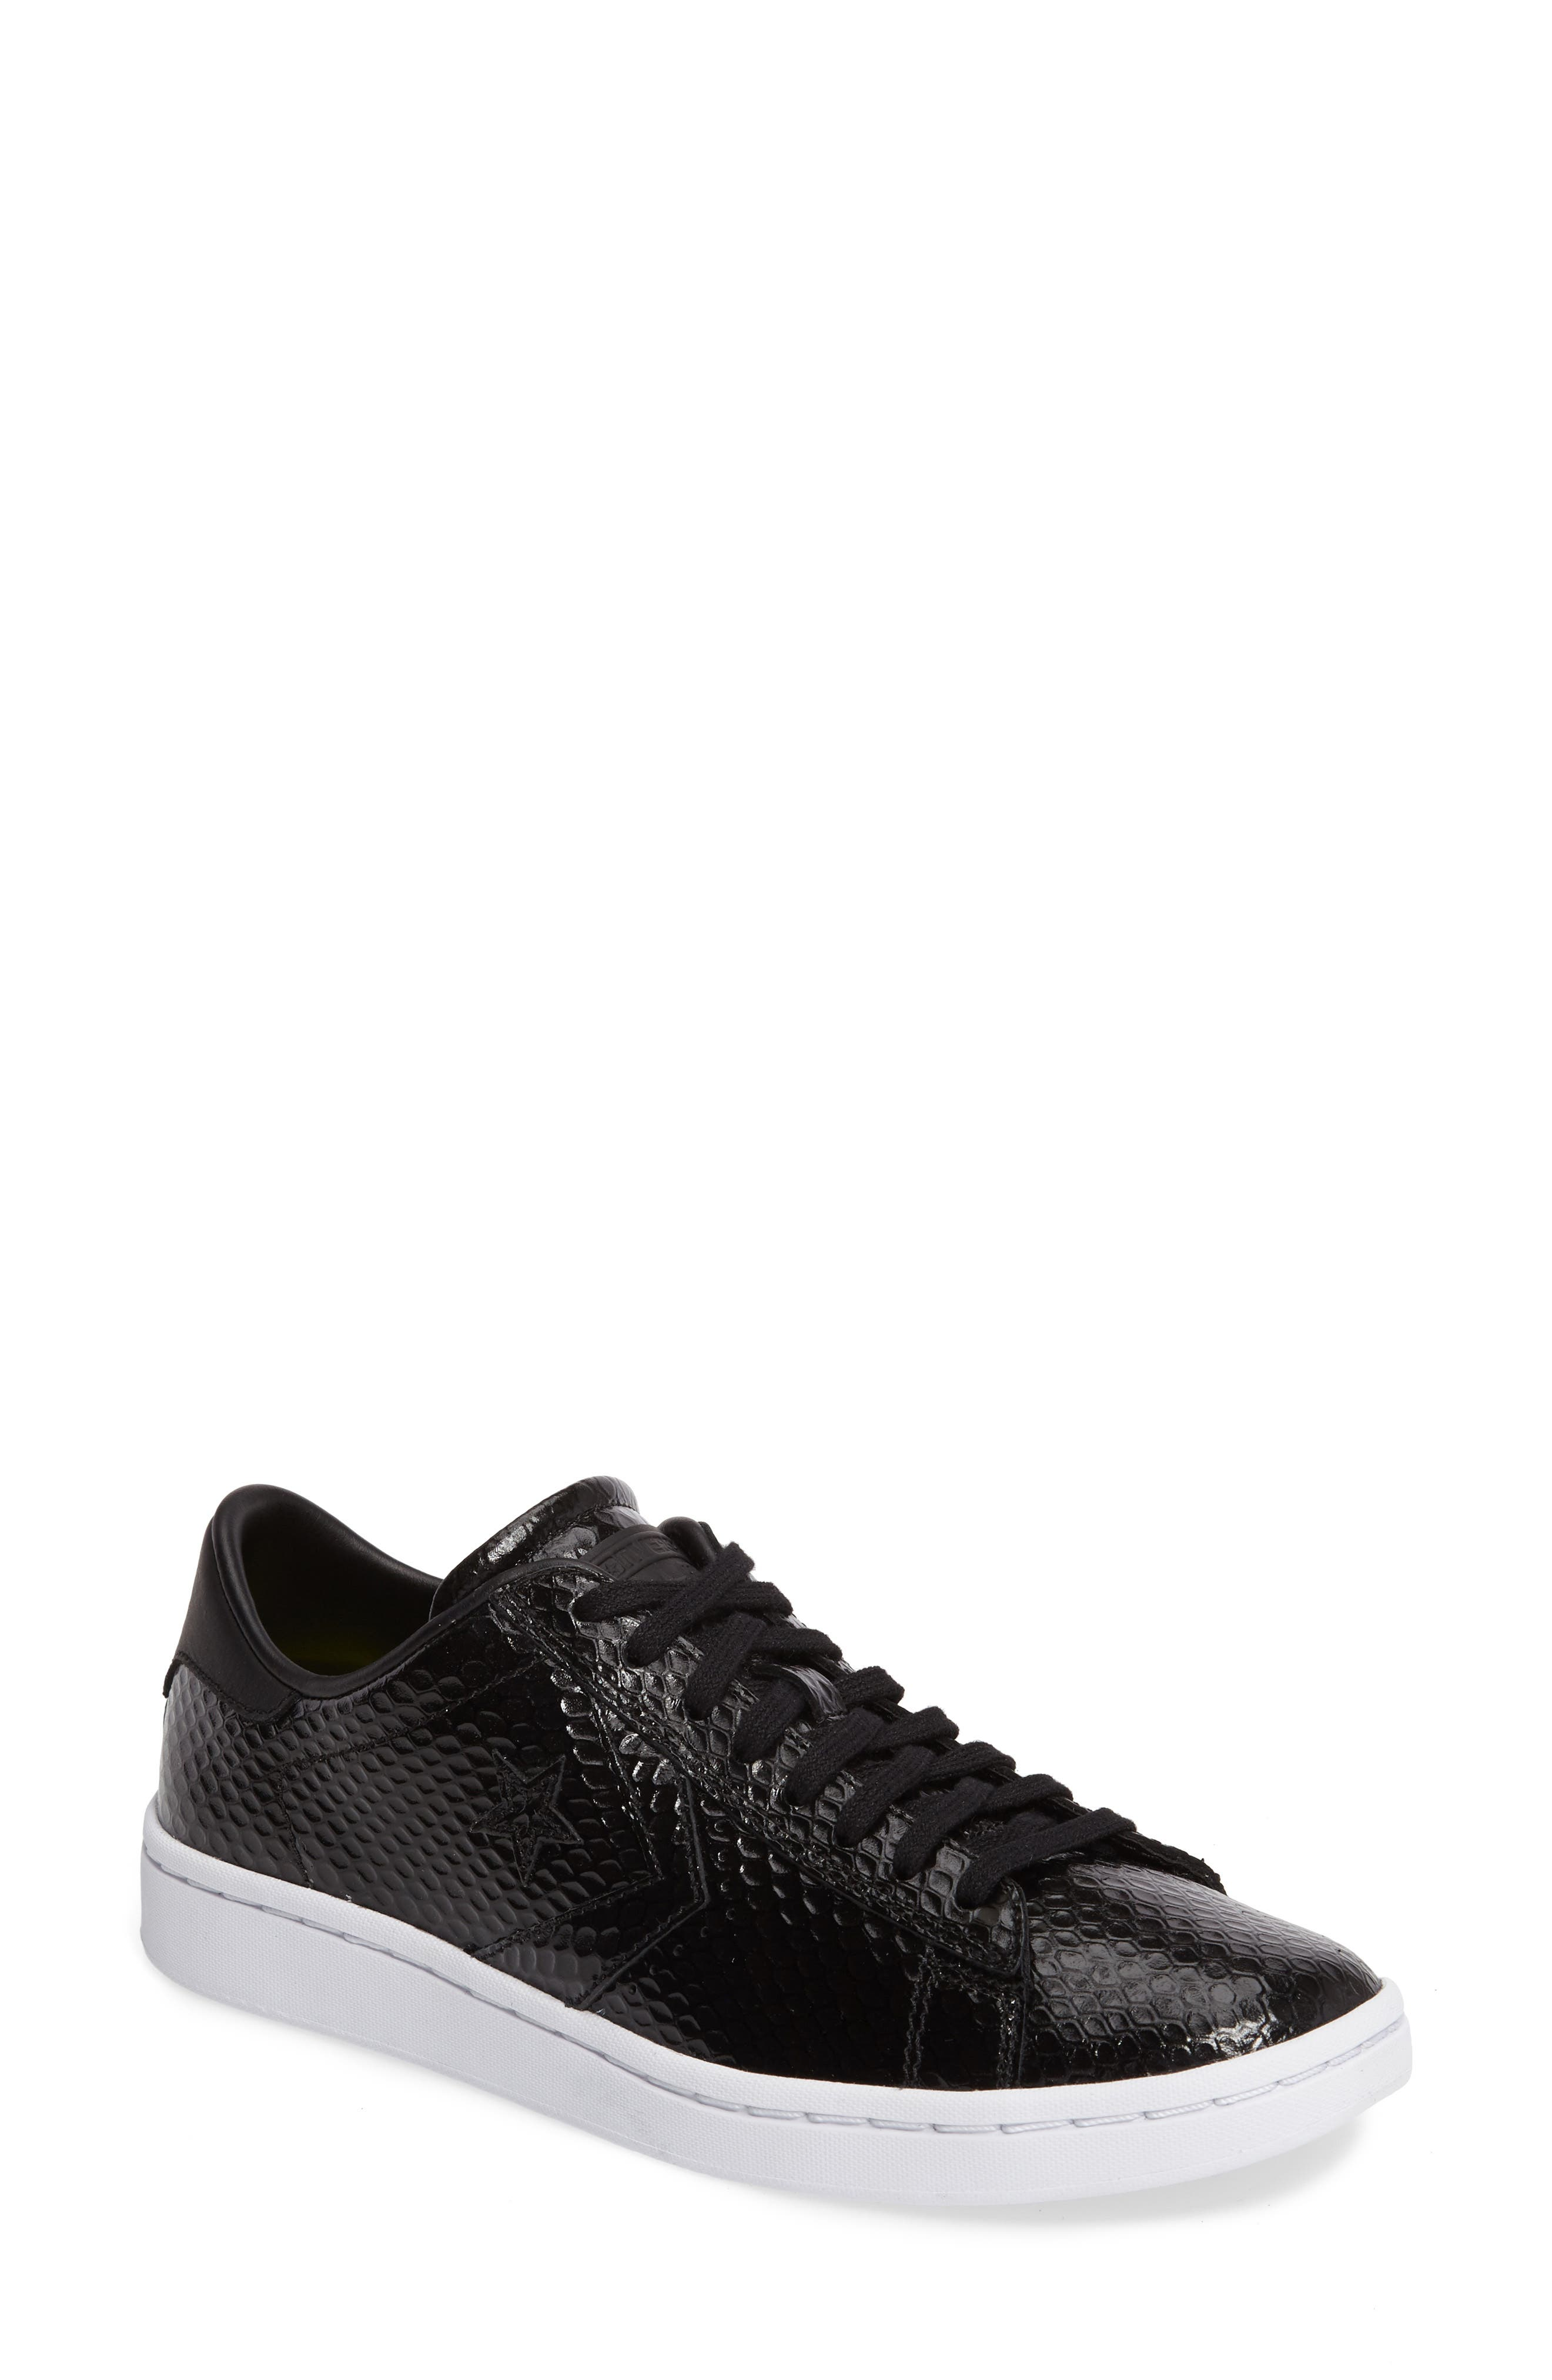 Alternate Image 1 Selected - Converse® Pro LP Sneaker (Women)